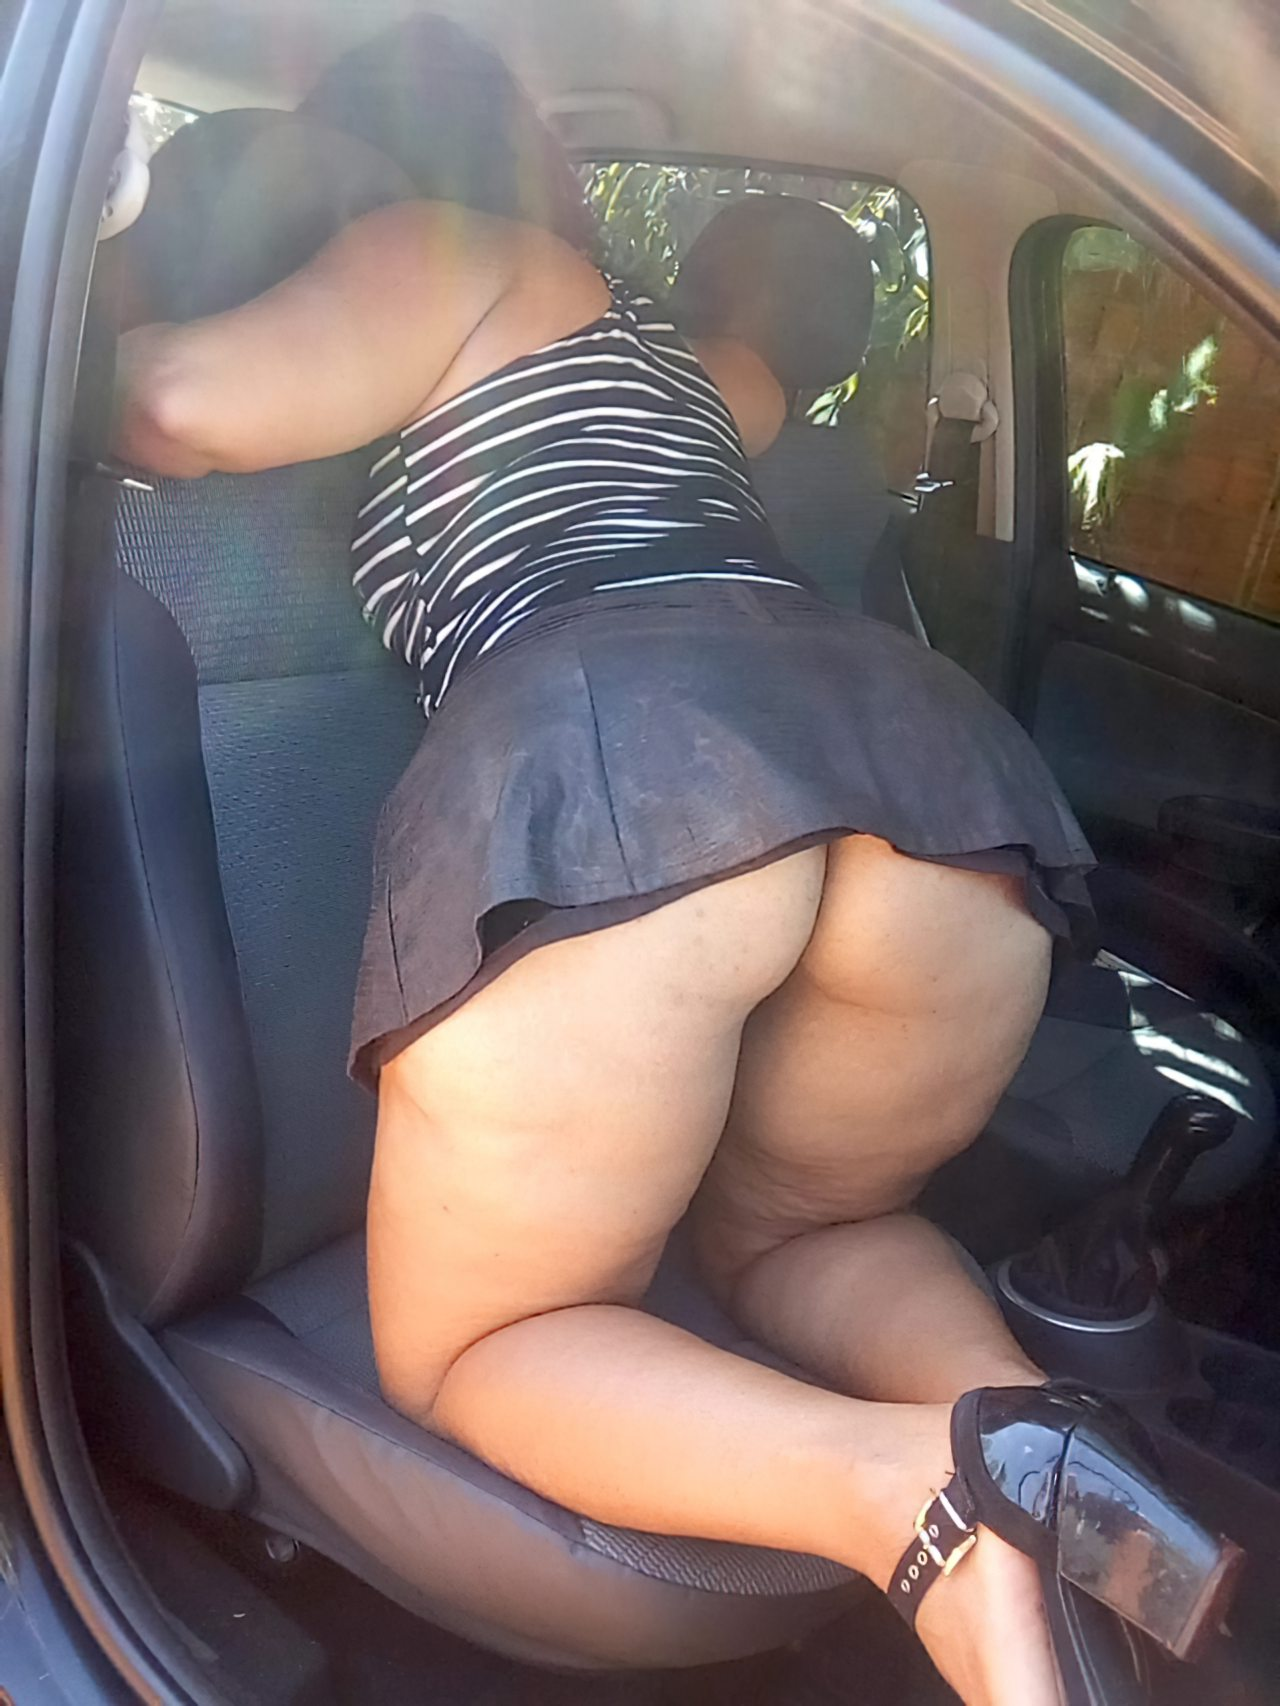 Linda Sedutora Mulher (2)